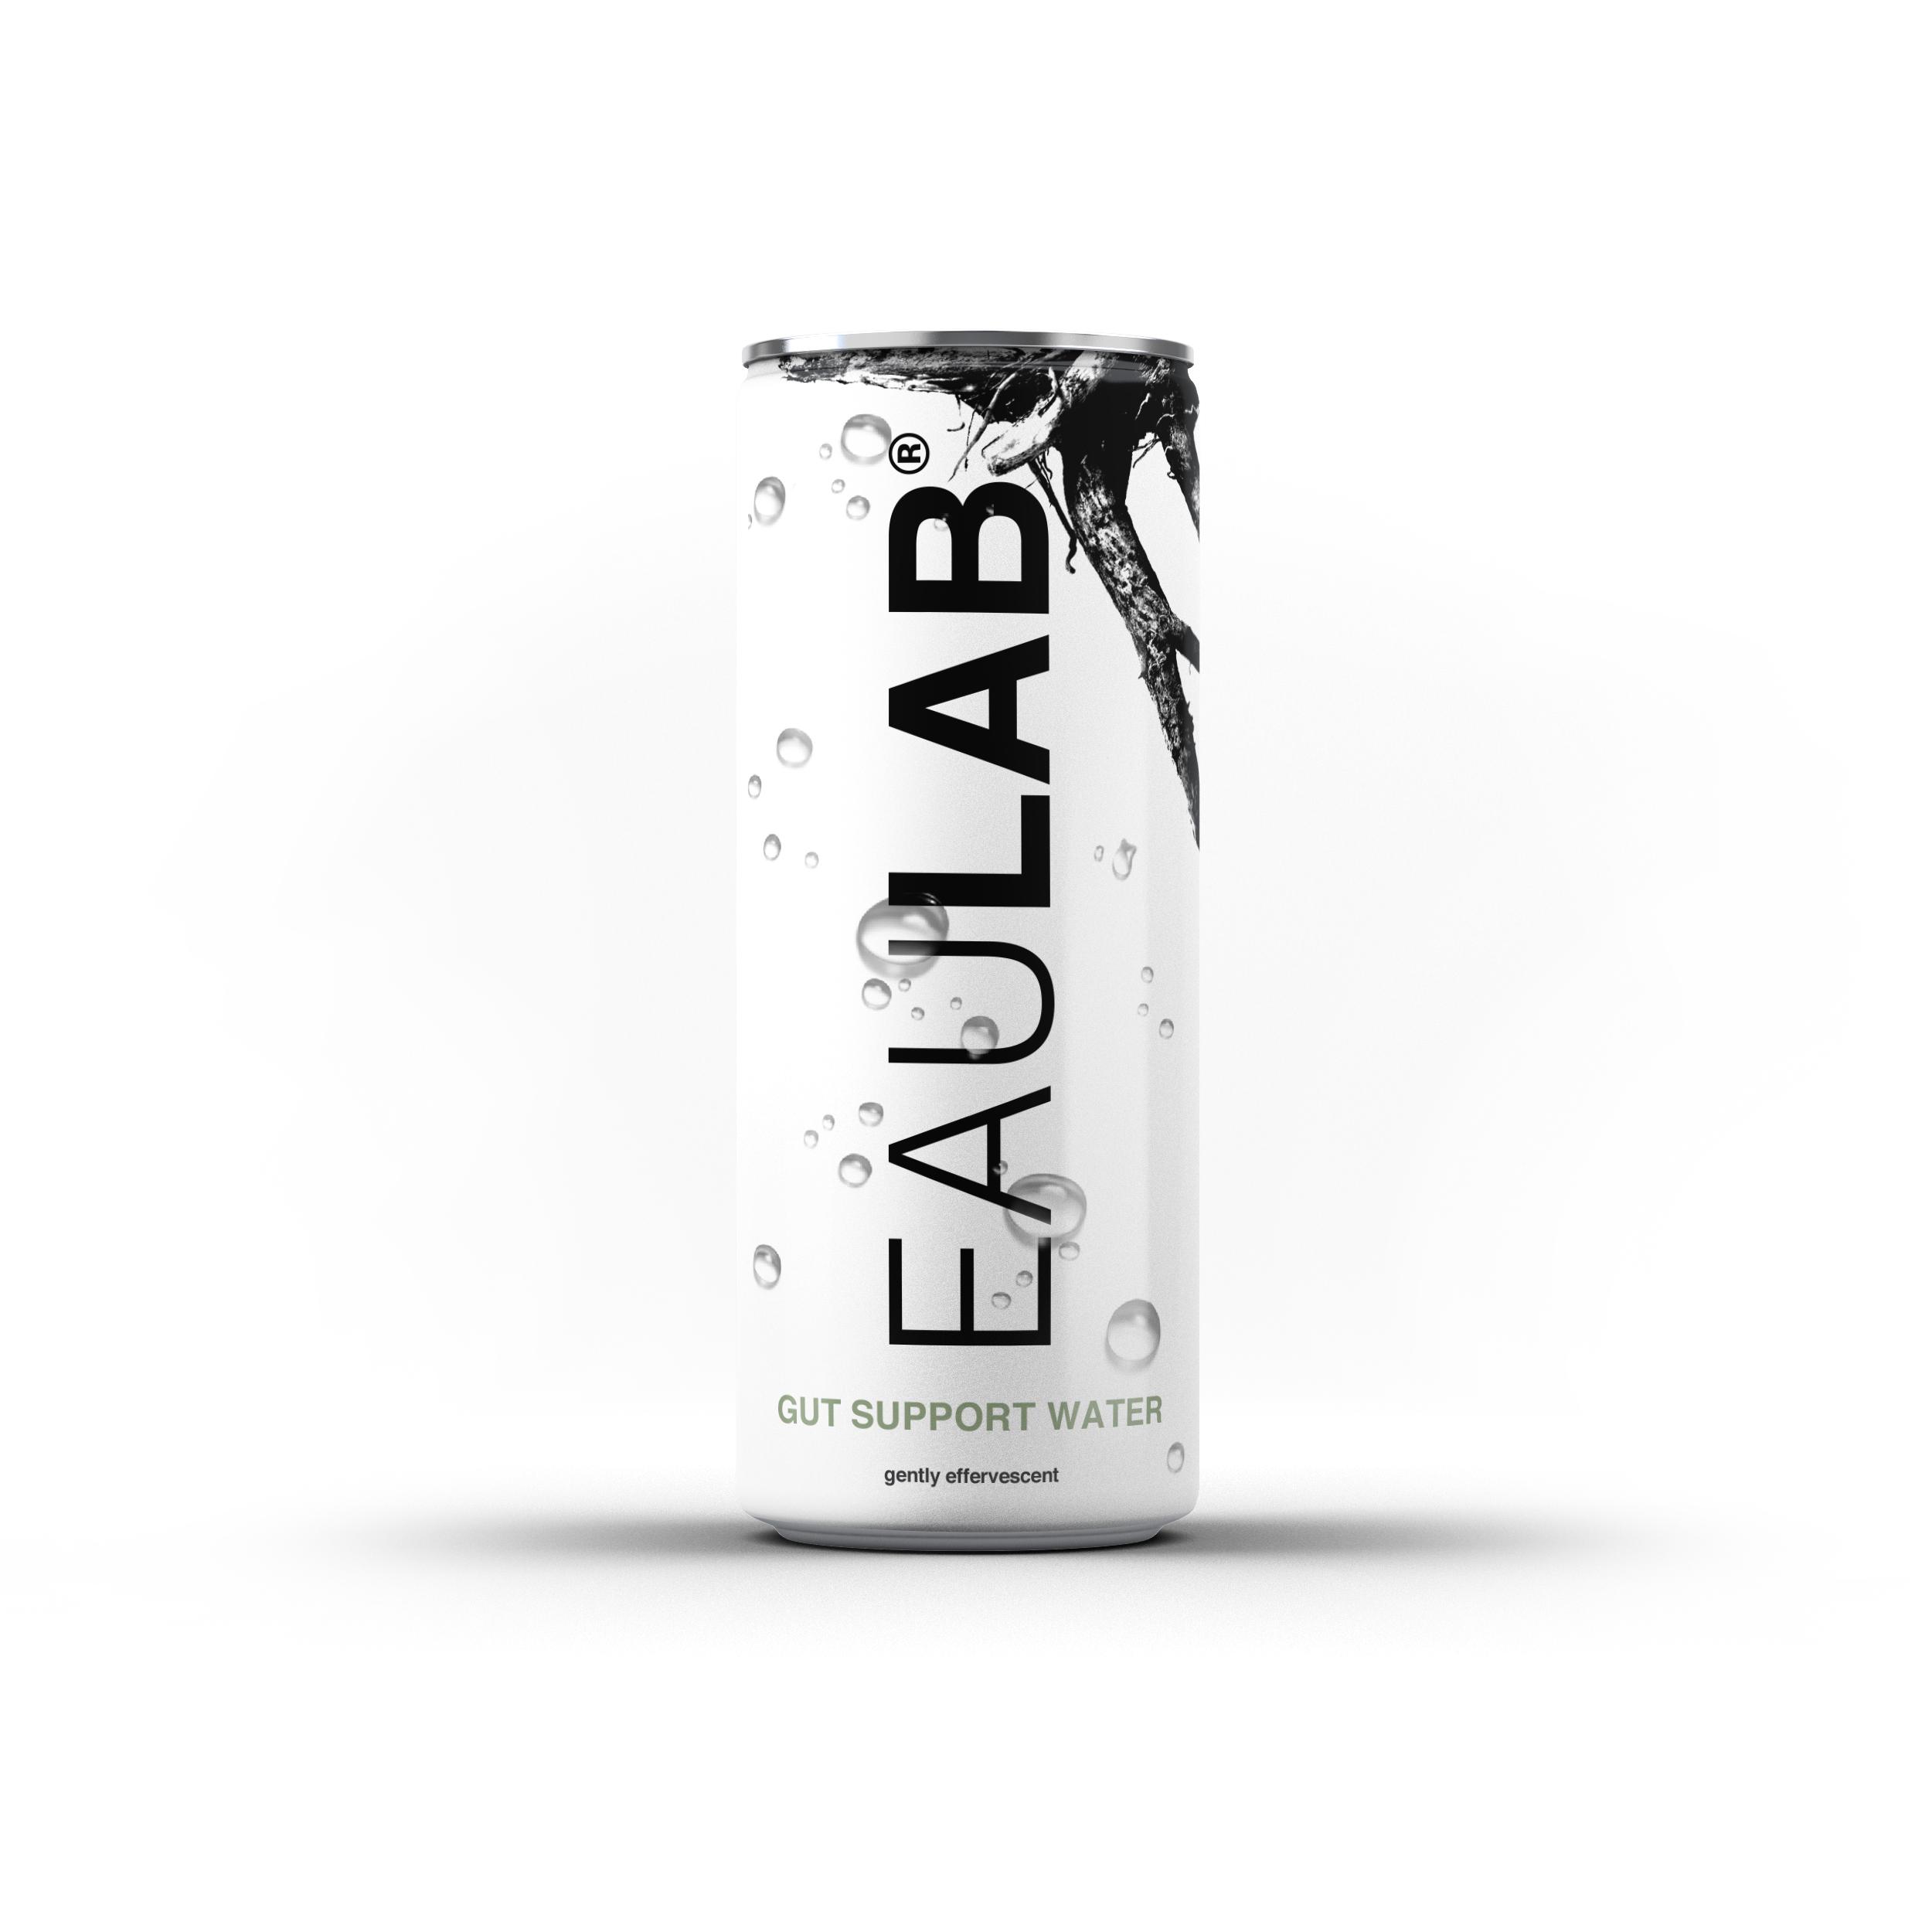 EauLab - Gut Support Water